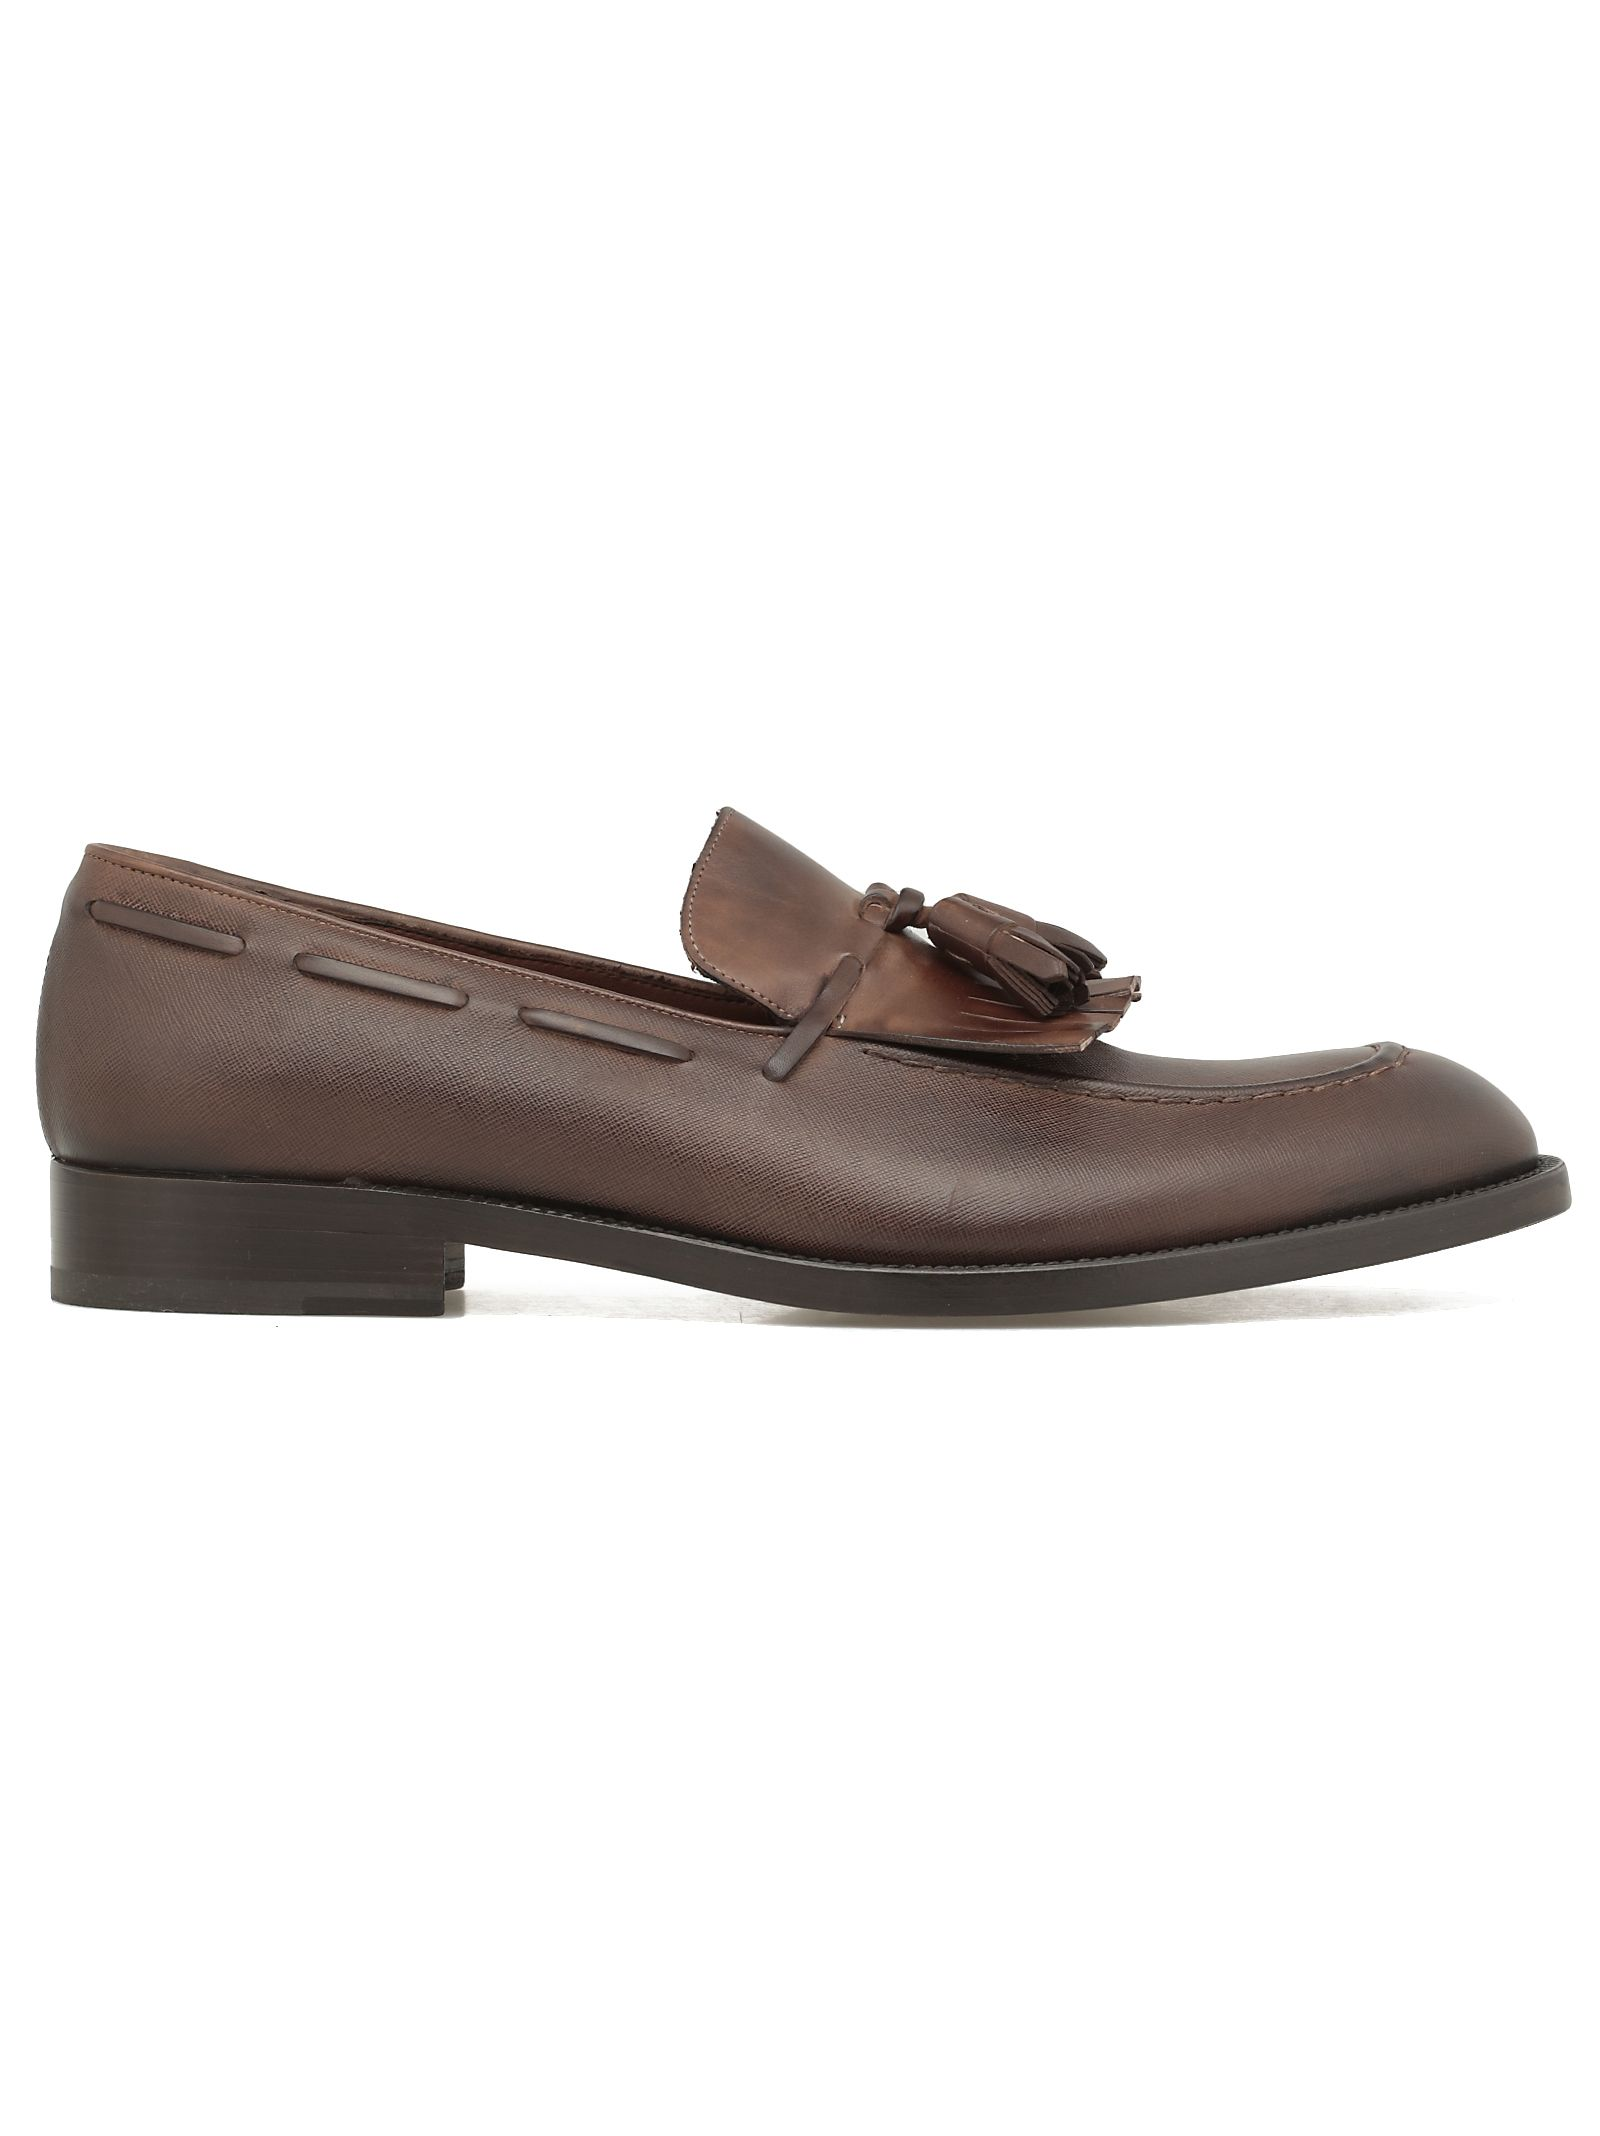 FRATELLI ROSSETTI Toledo Mini Loafer in Brown